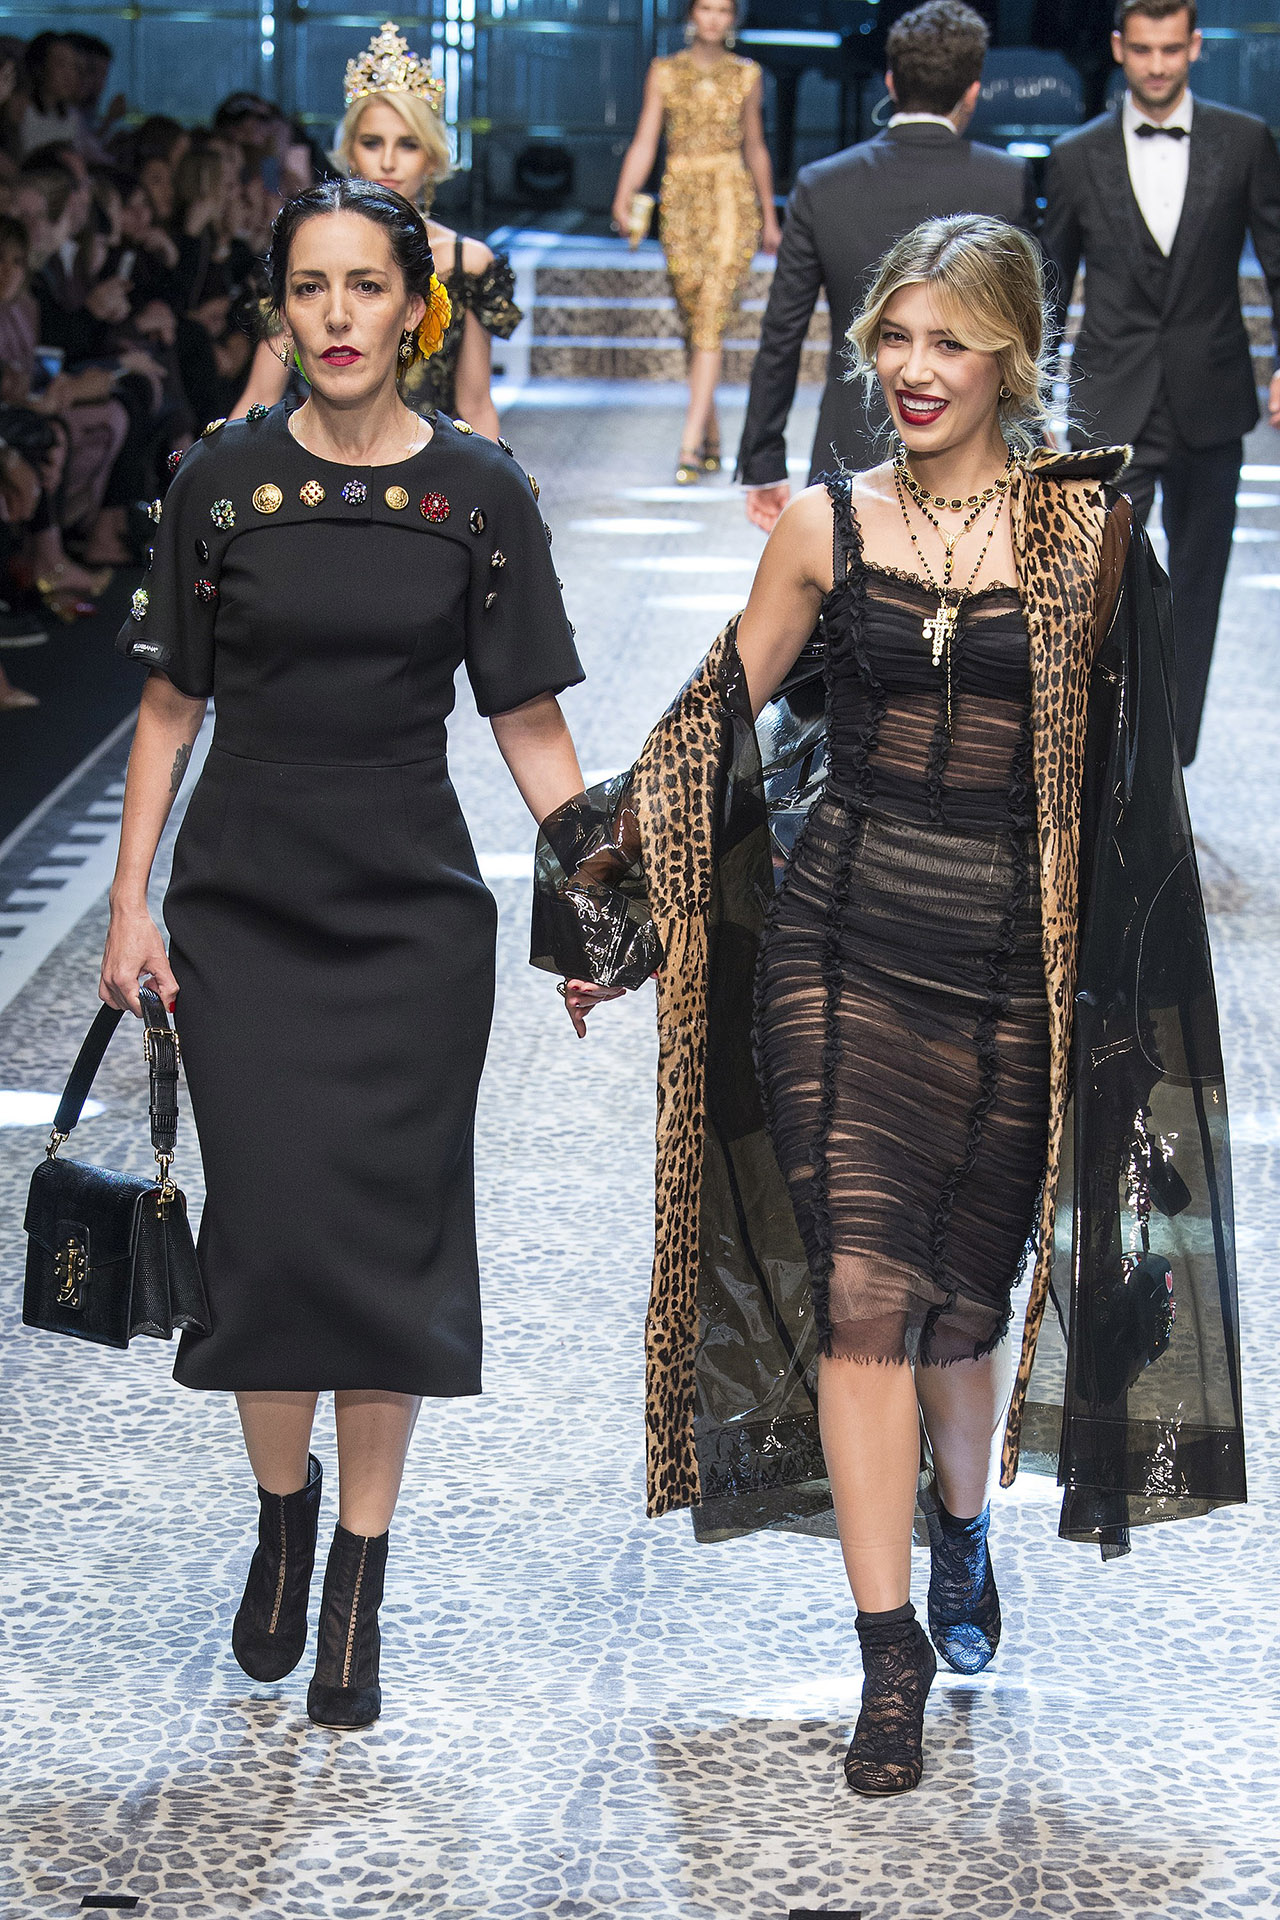 Michelle Salas for Dolce & Gabbana Fall 2017